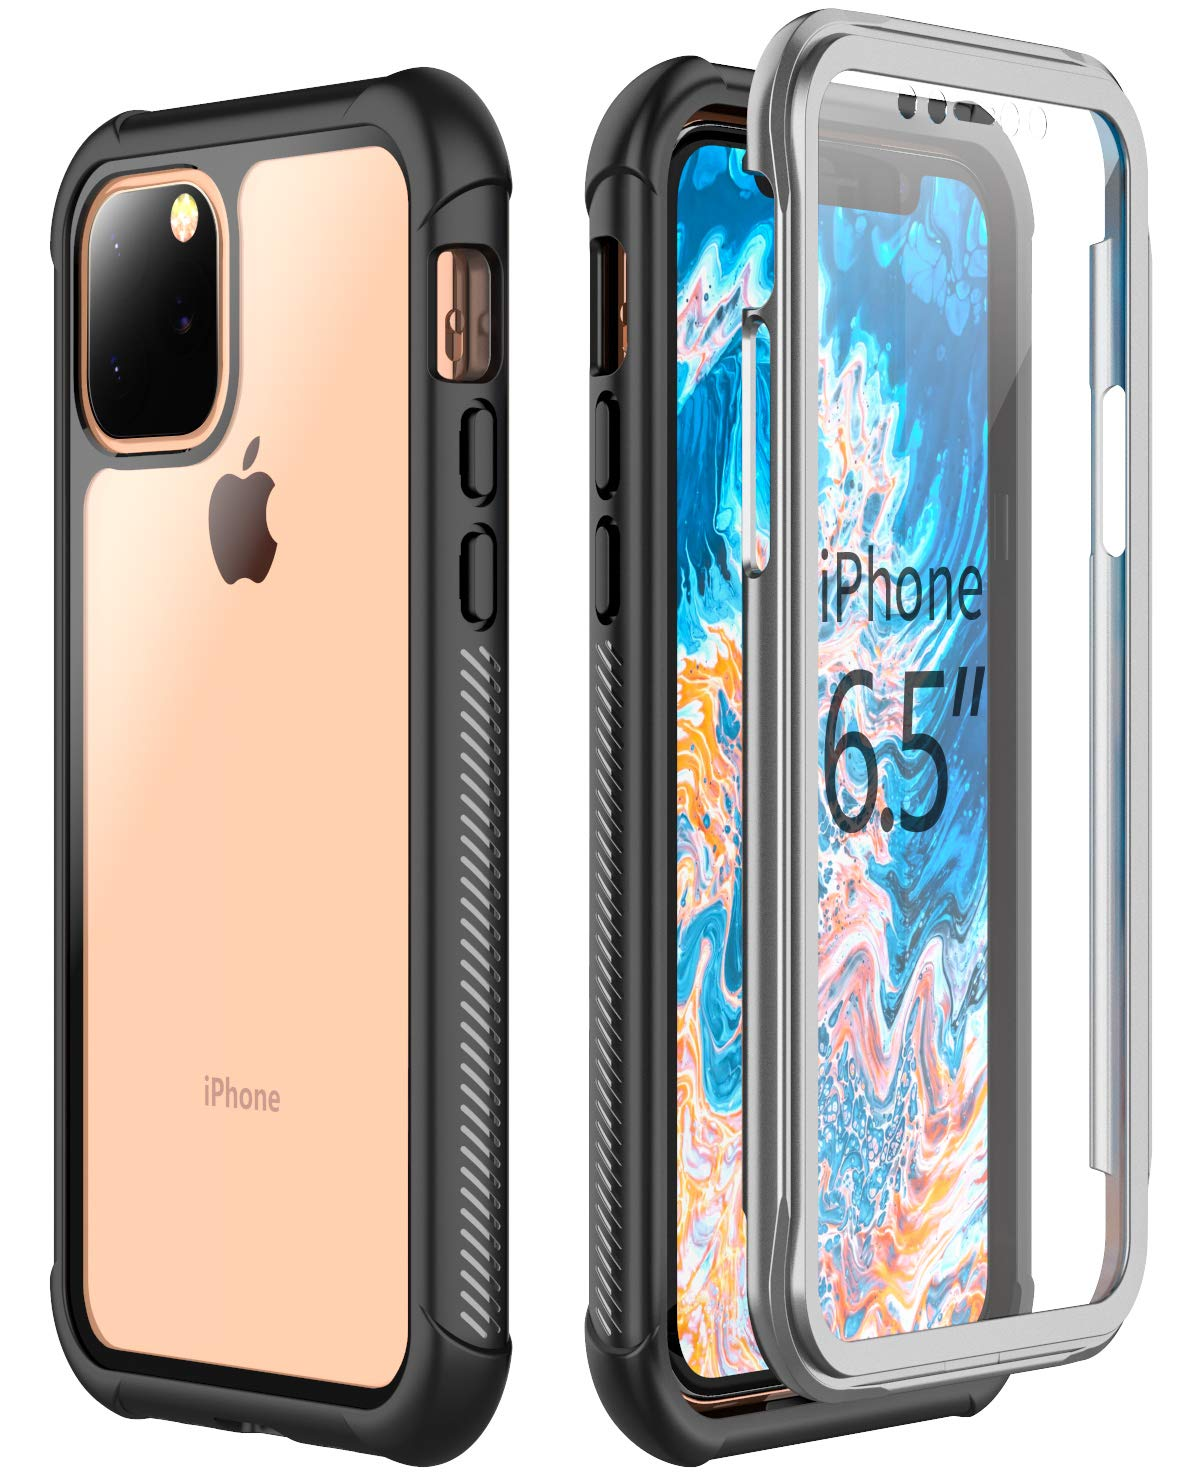 Funda iPhone 11 Pro Max Spidercase [7wlpfrp7]